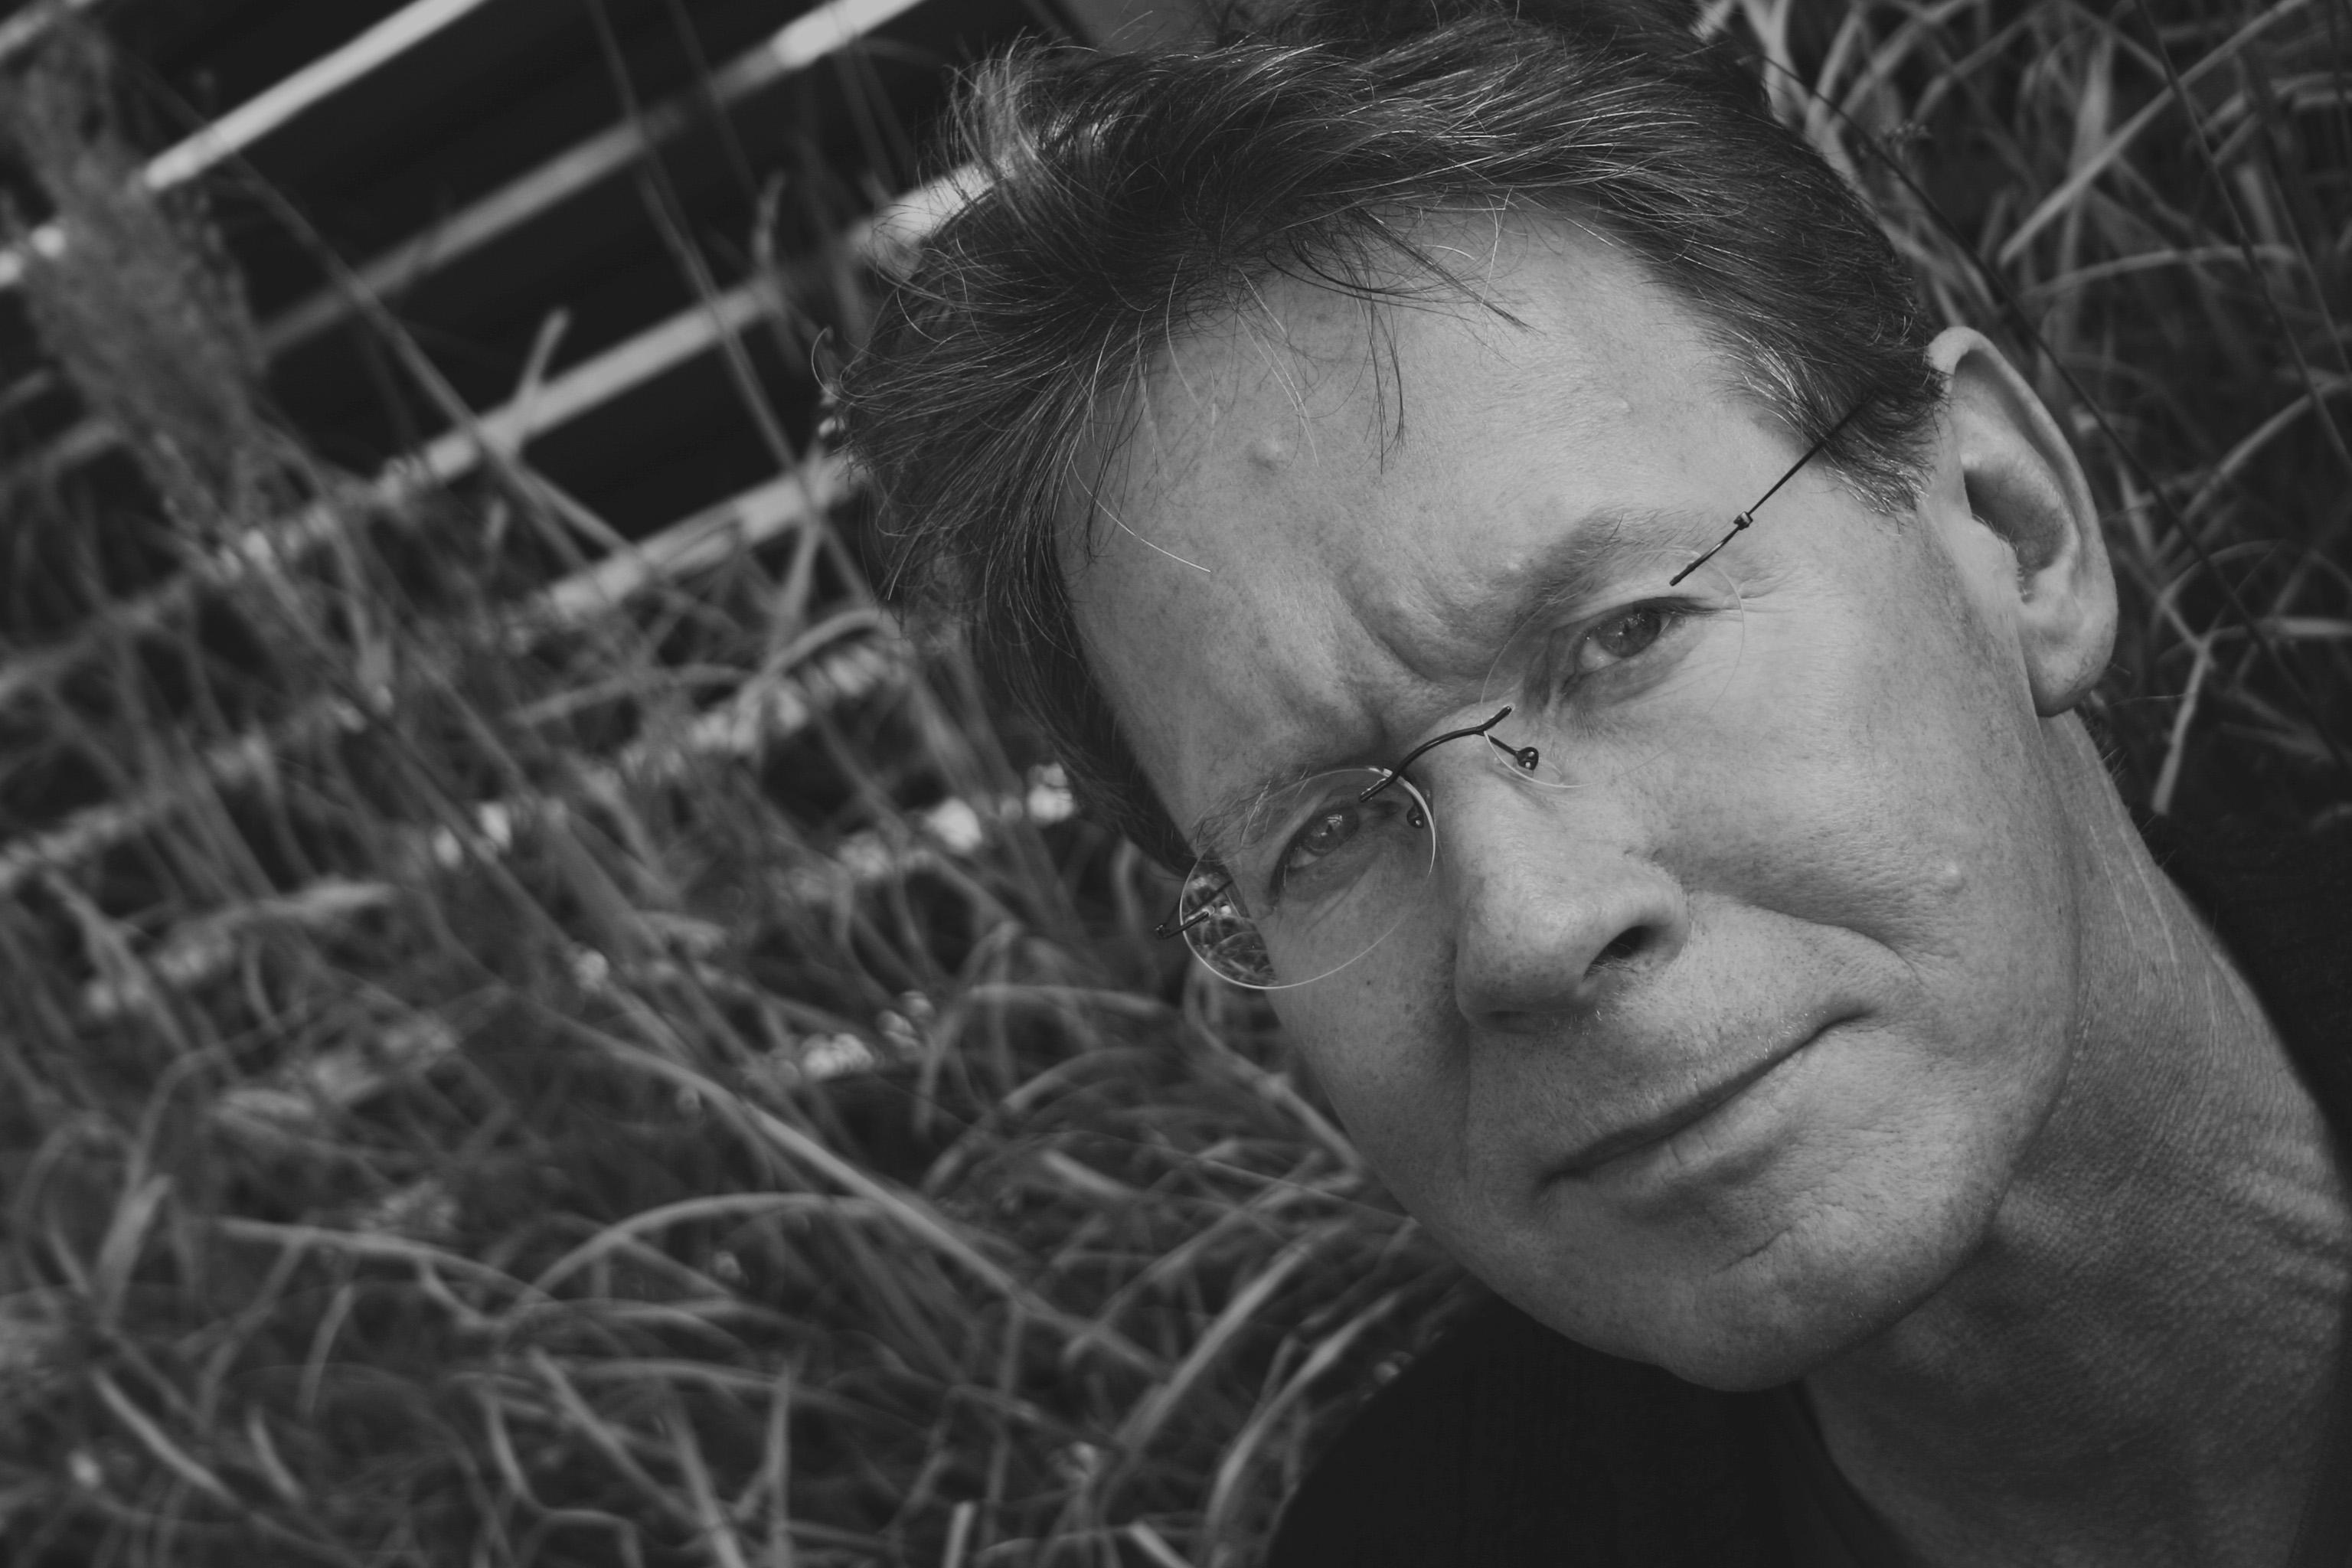 Willem Lutje Hulsik